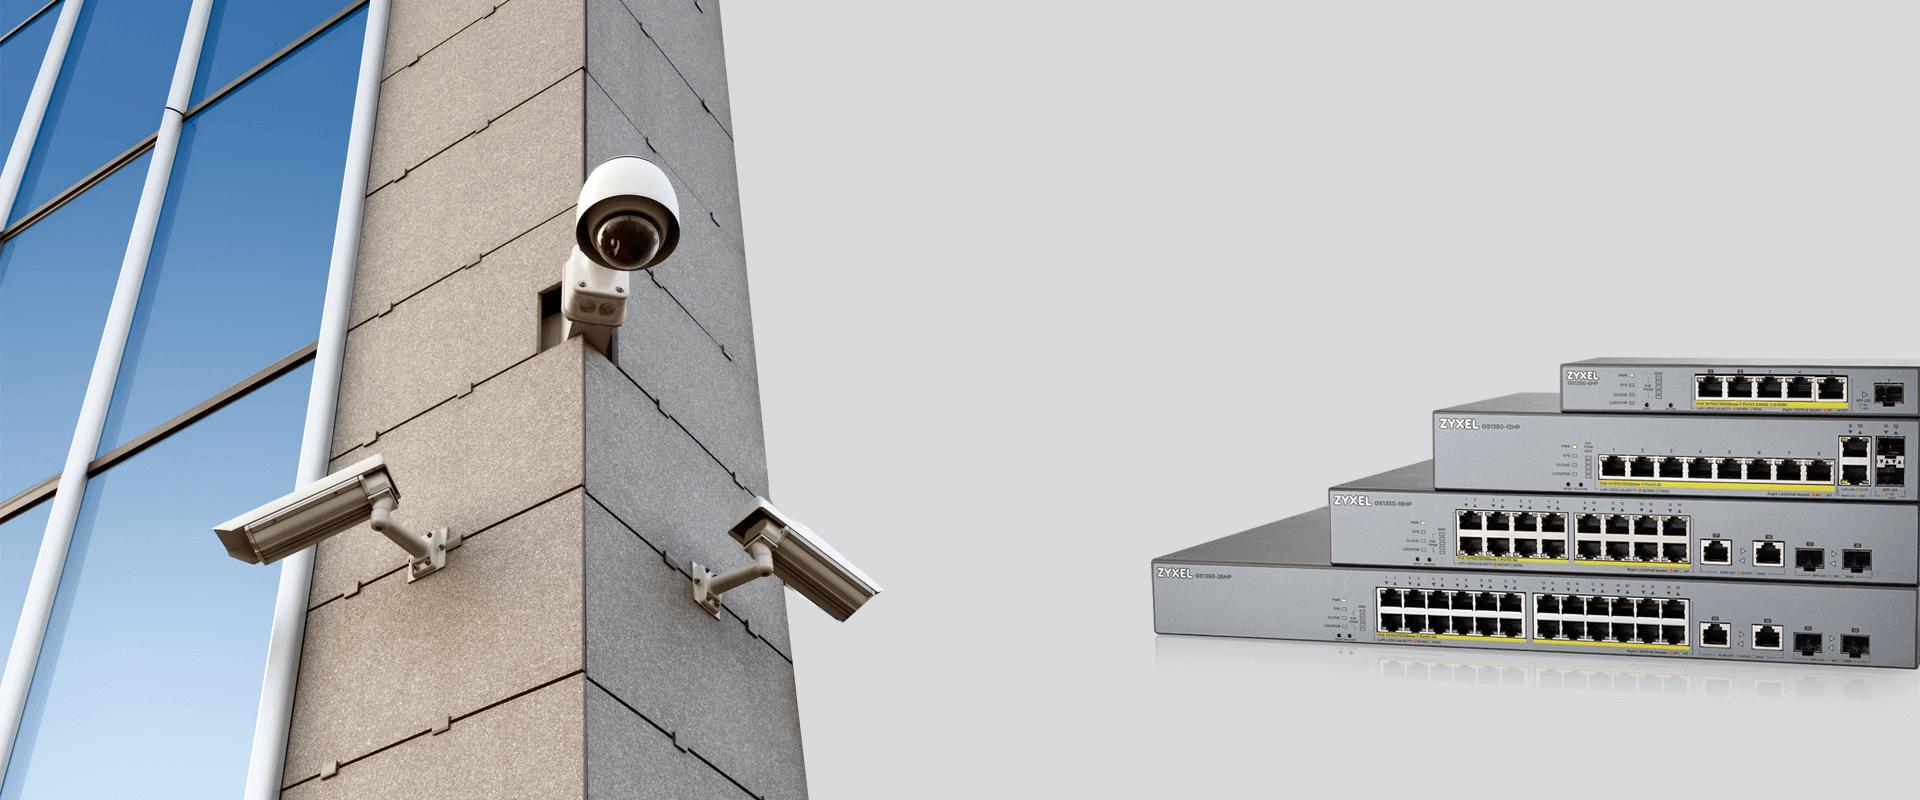 Design For Surveillance